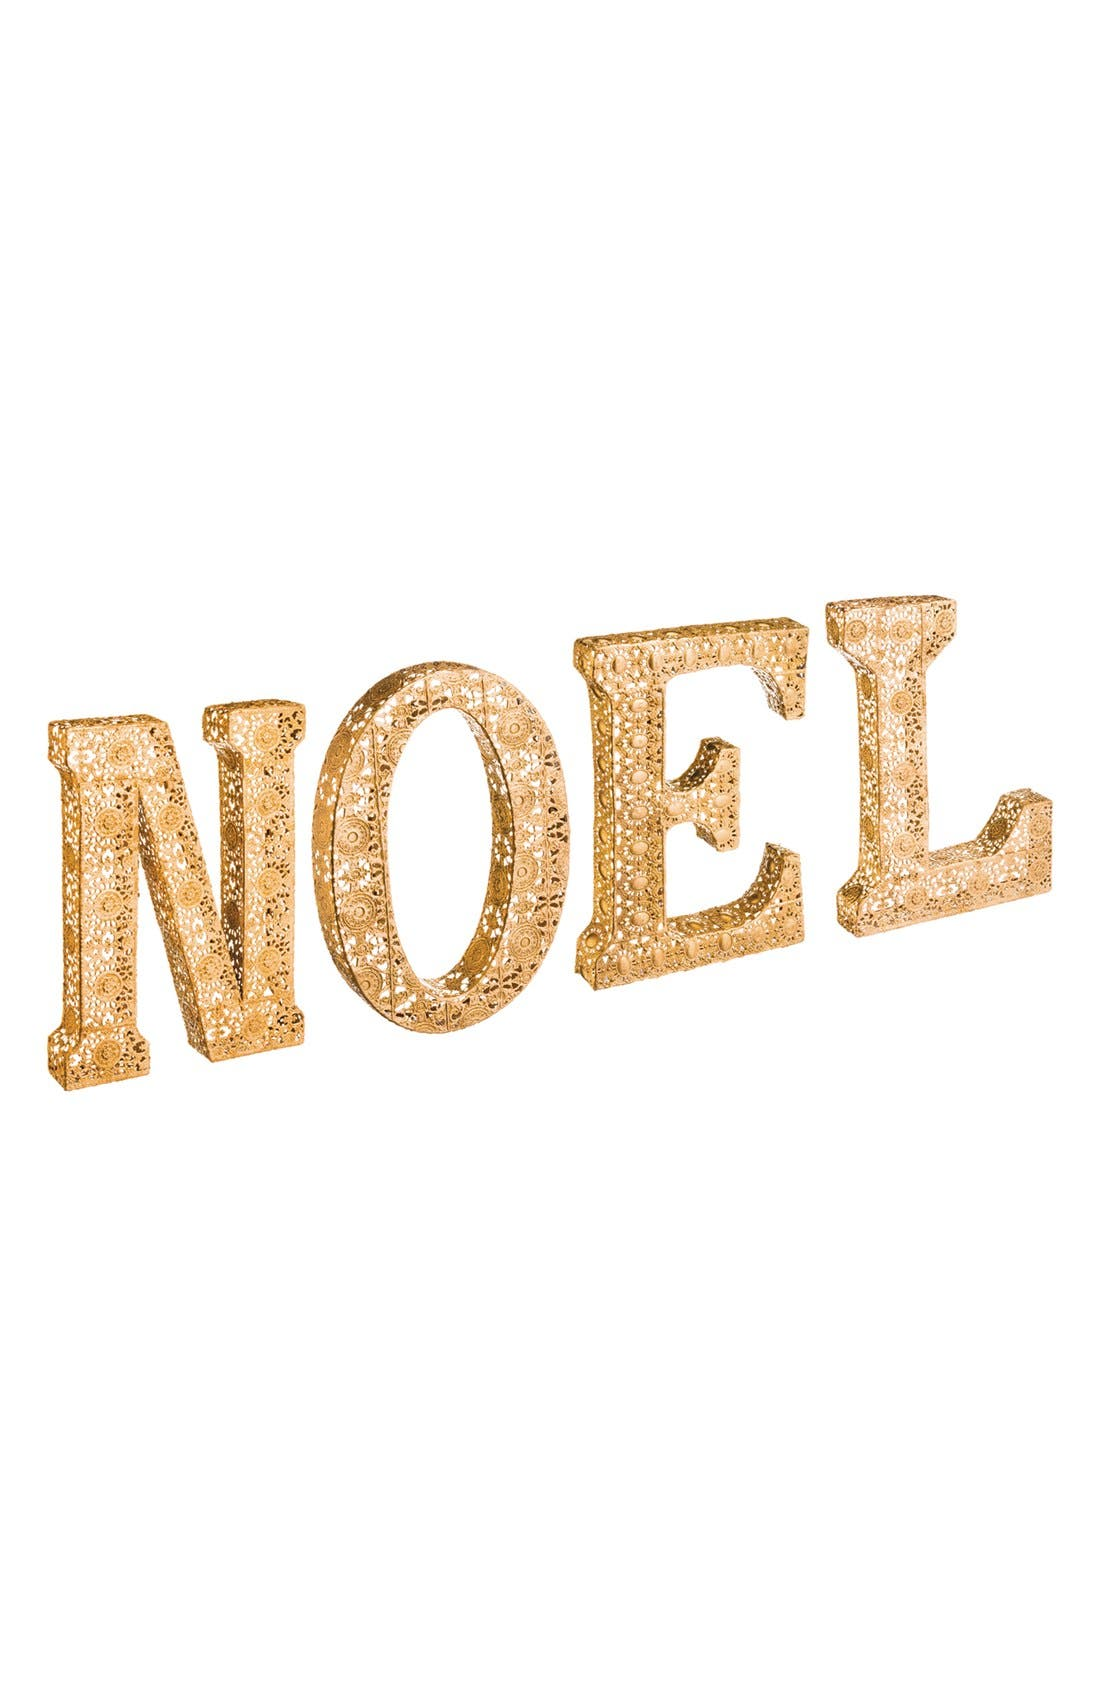 Main Image - ALLSTATE 'Noel' Wall Art